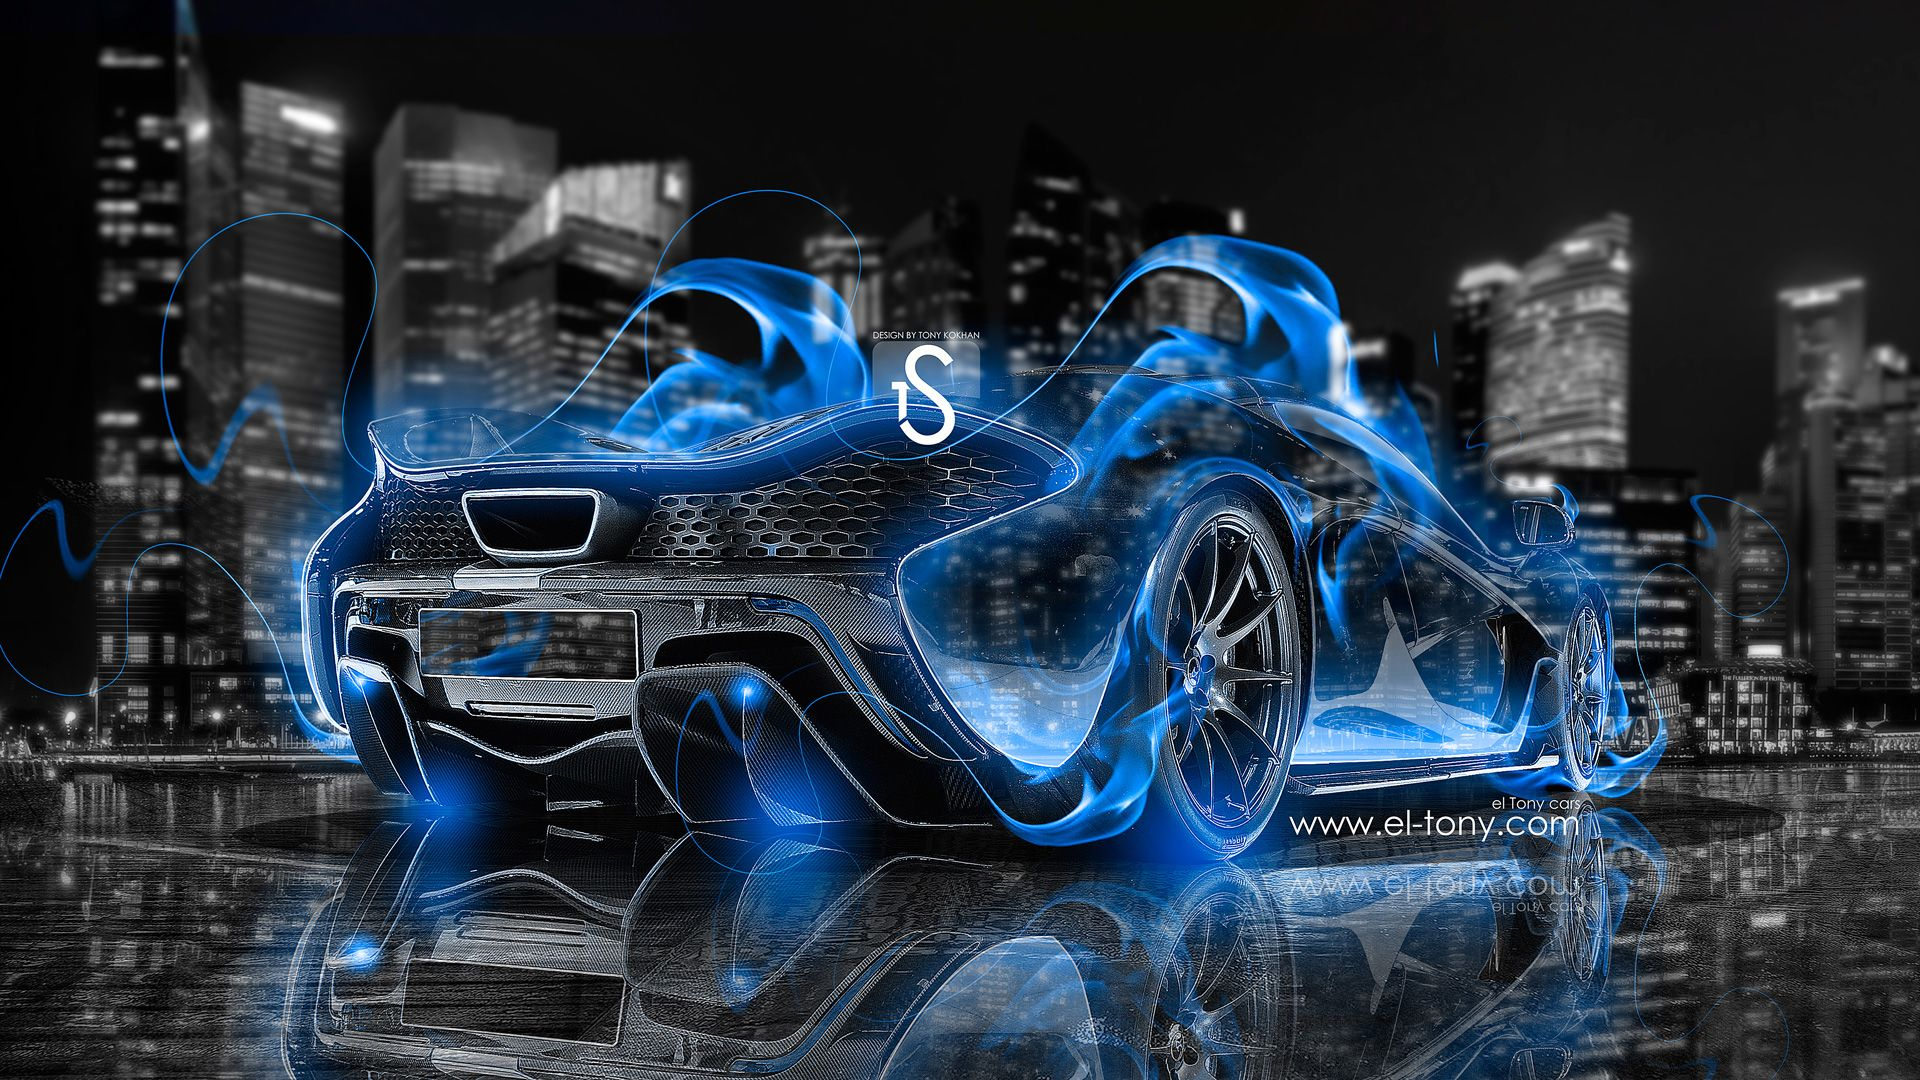 Mclaren P1 Gtr Logo >> Cars - McLaren P1 - McLaren-P1-Blue-Fire-City-Car-2013-Crystal-HD-Wallpapers-by-Tony-Kokhan-www ...